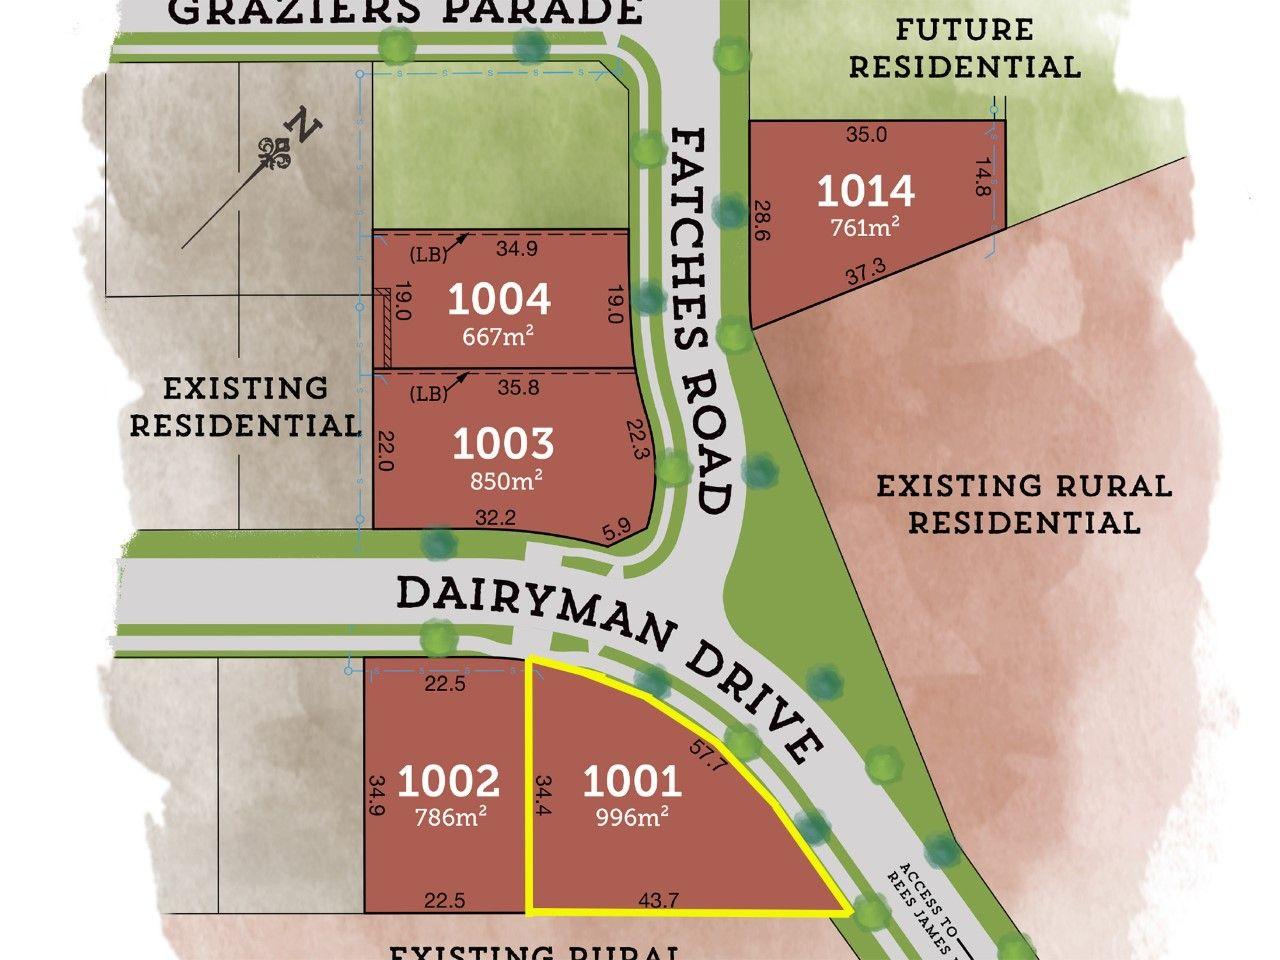 Lot 1001 Dairyman Drive Raymond Terrace 2324